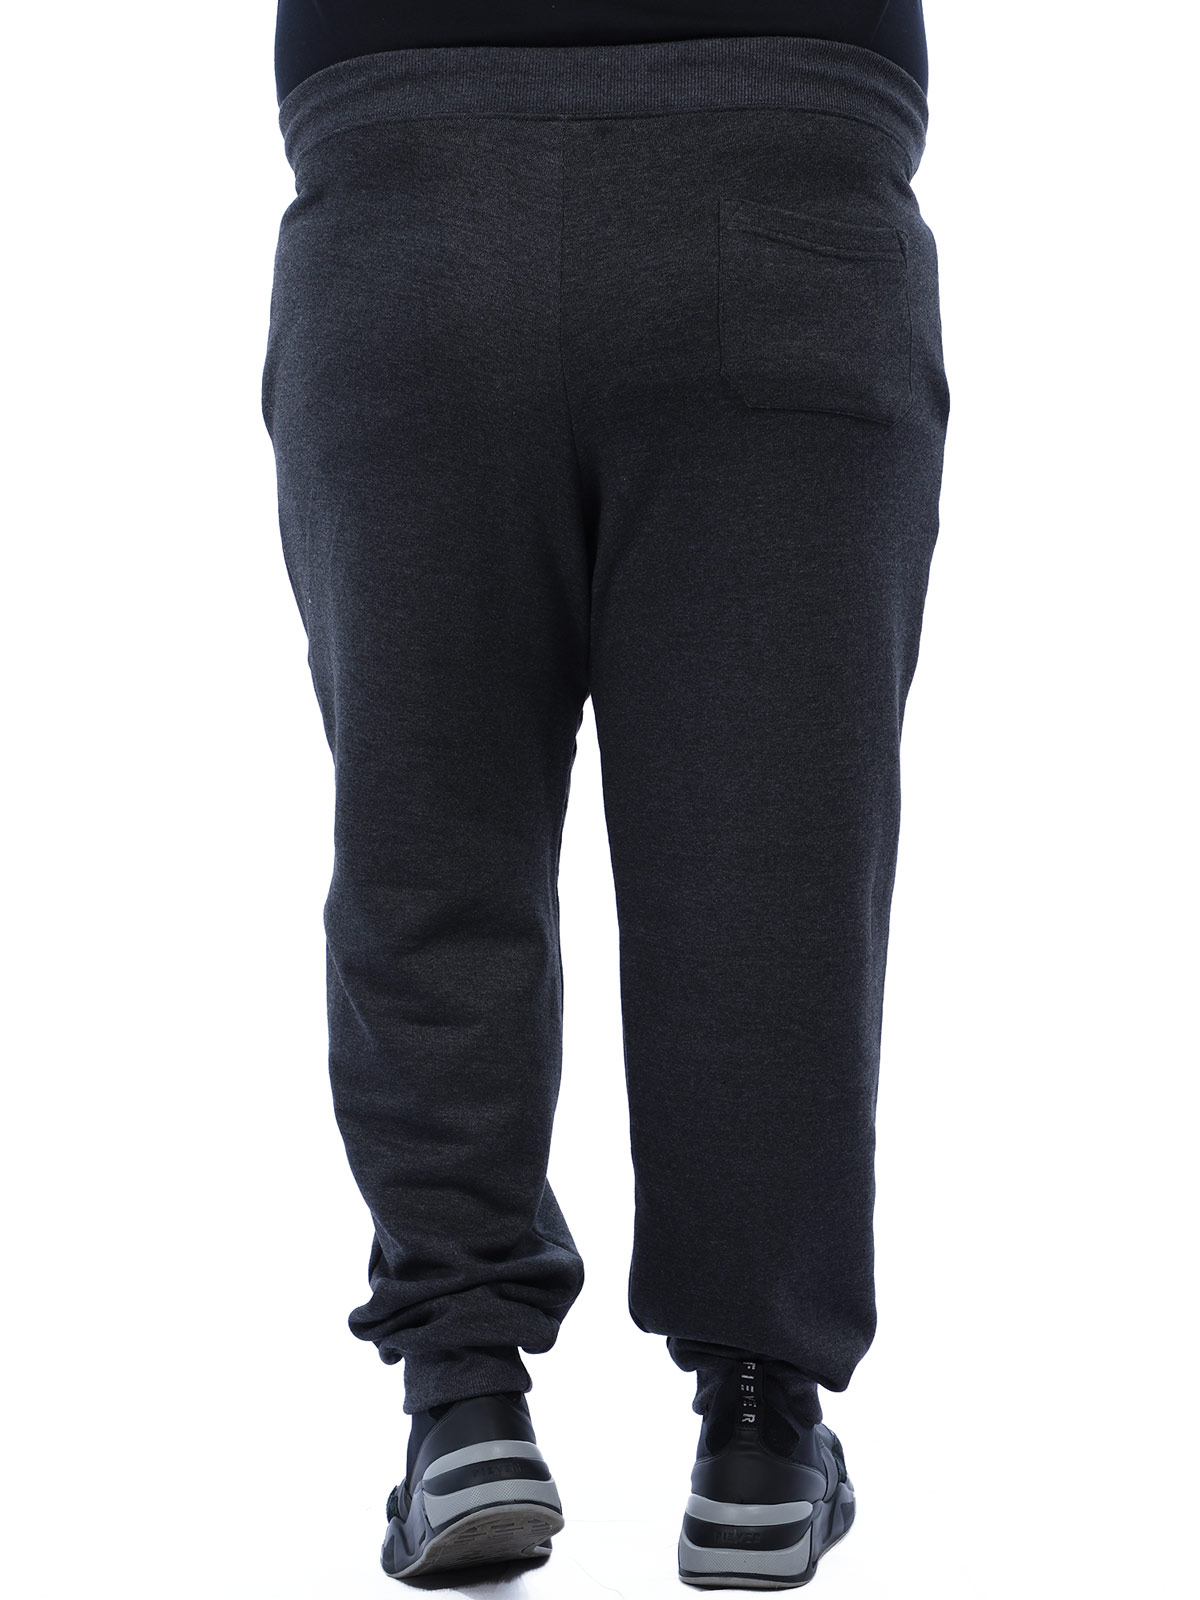 Calça Plus Size Masculino de Moletom Sem Felpa Anistia Mescla